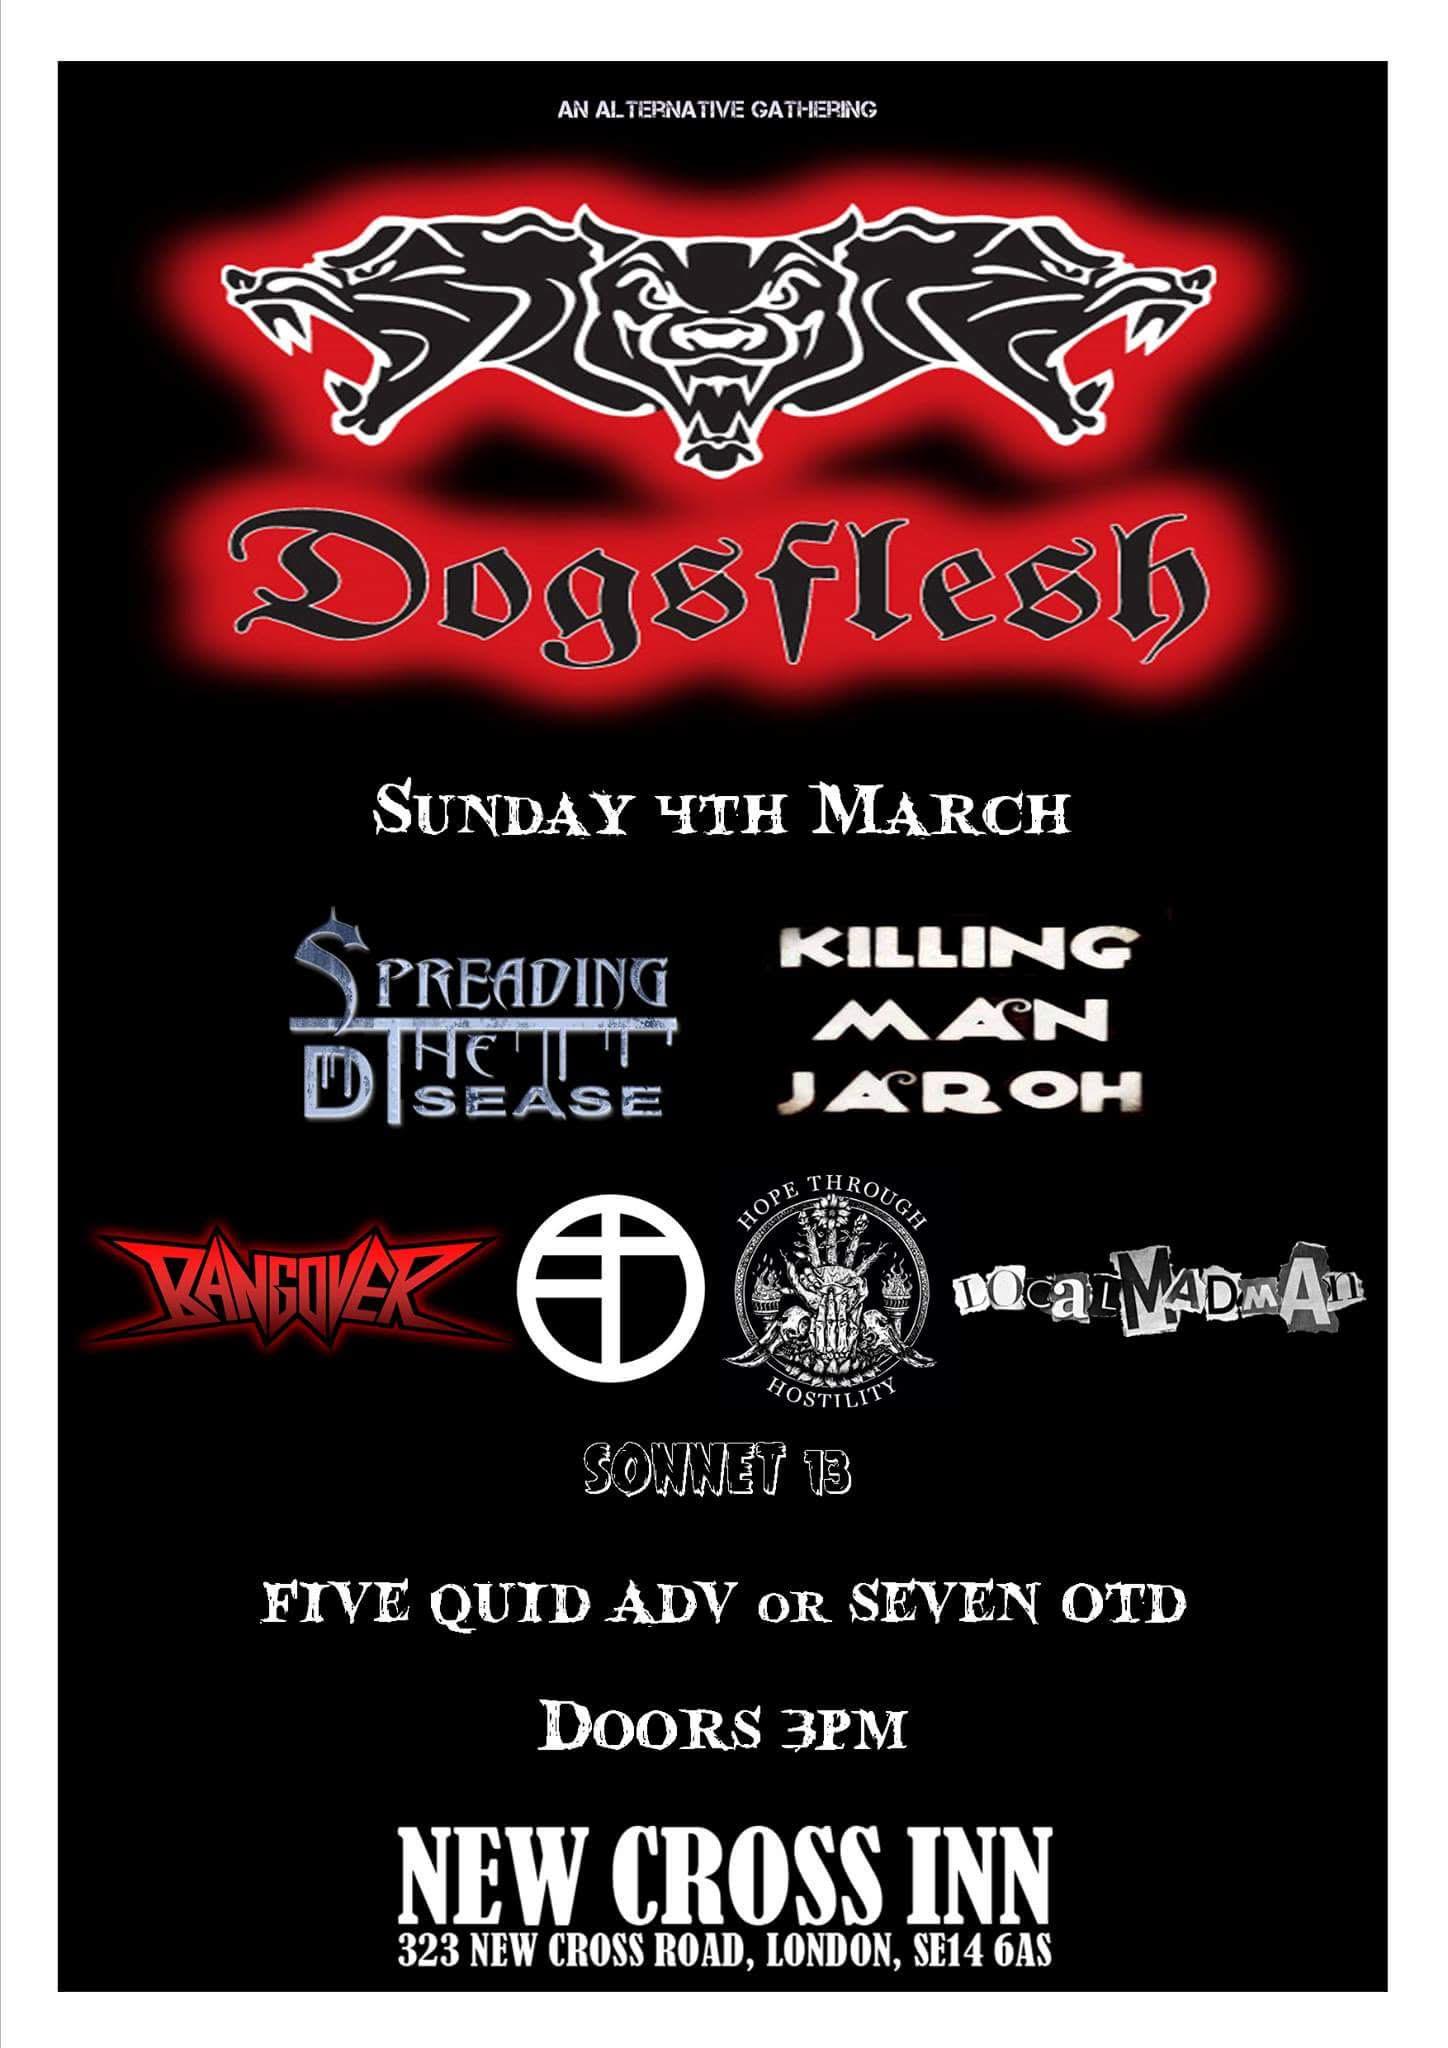 dogflesh STD Poster new cross inn 2018